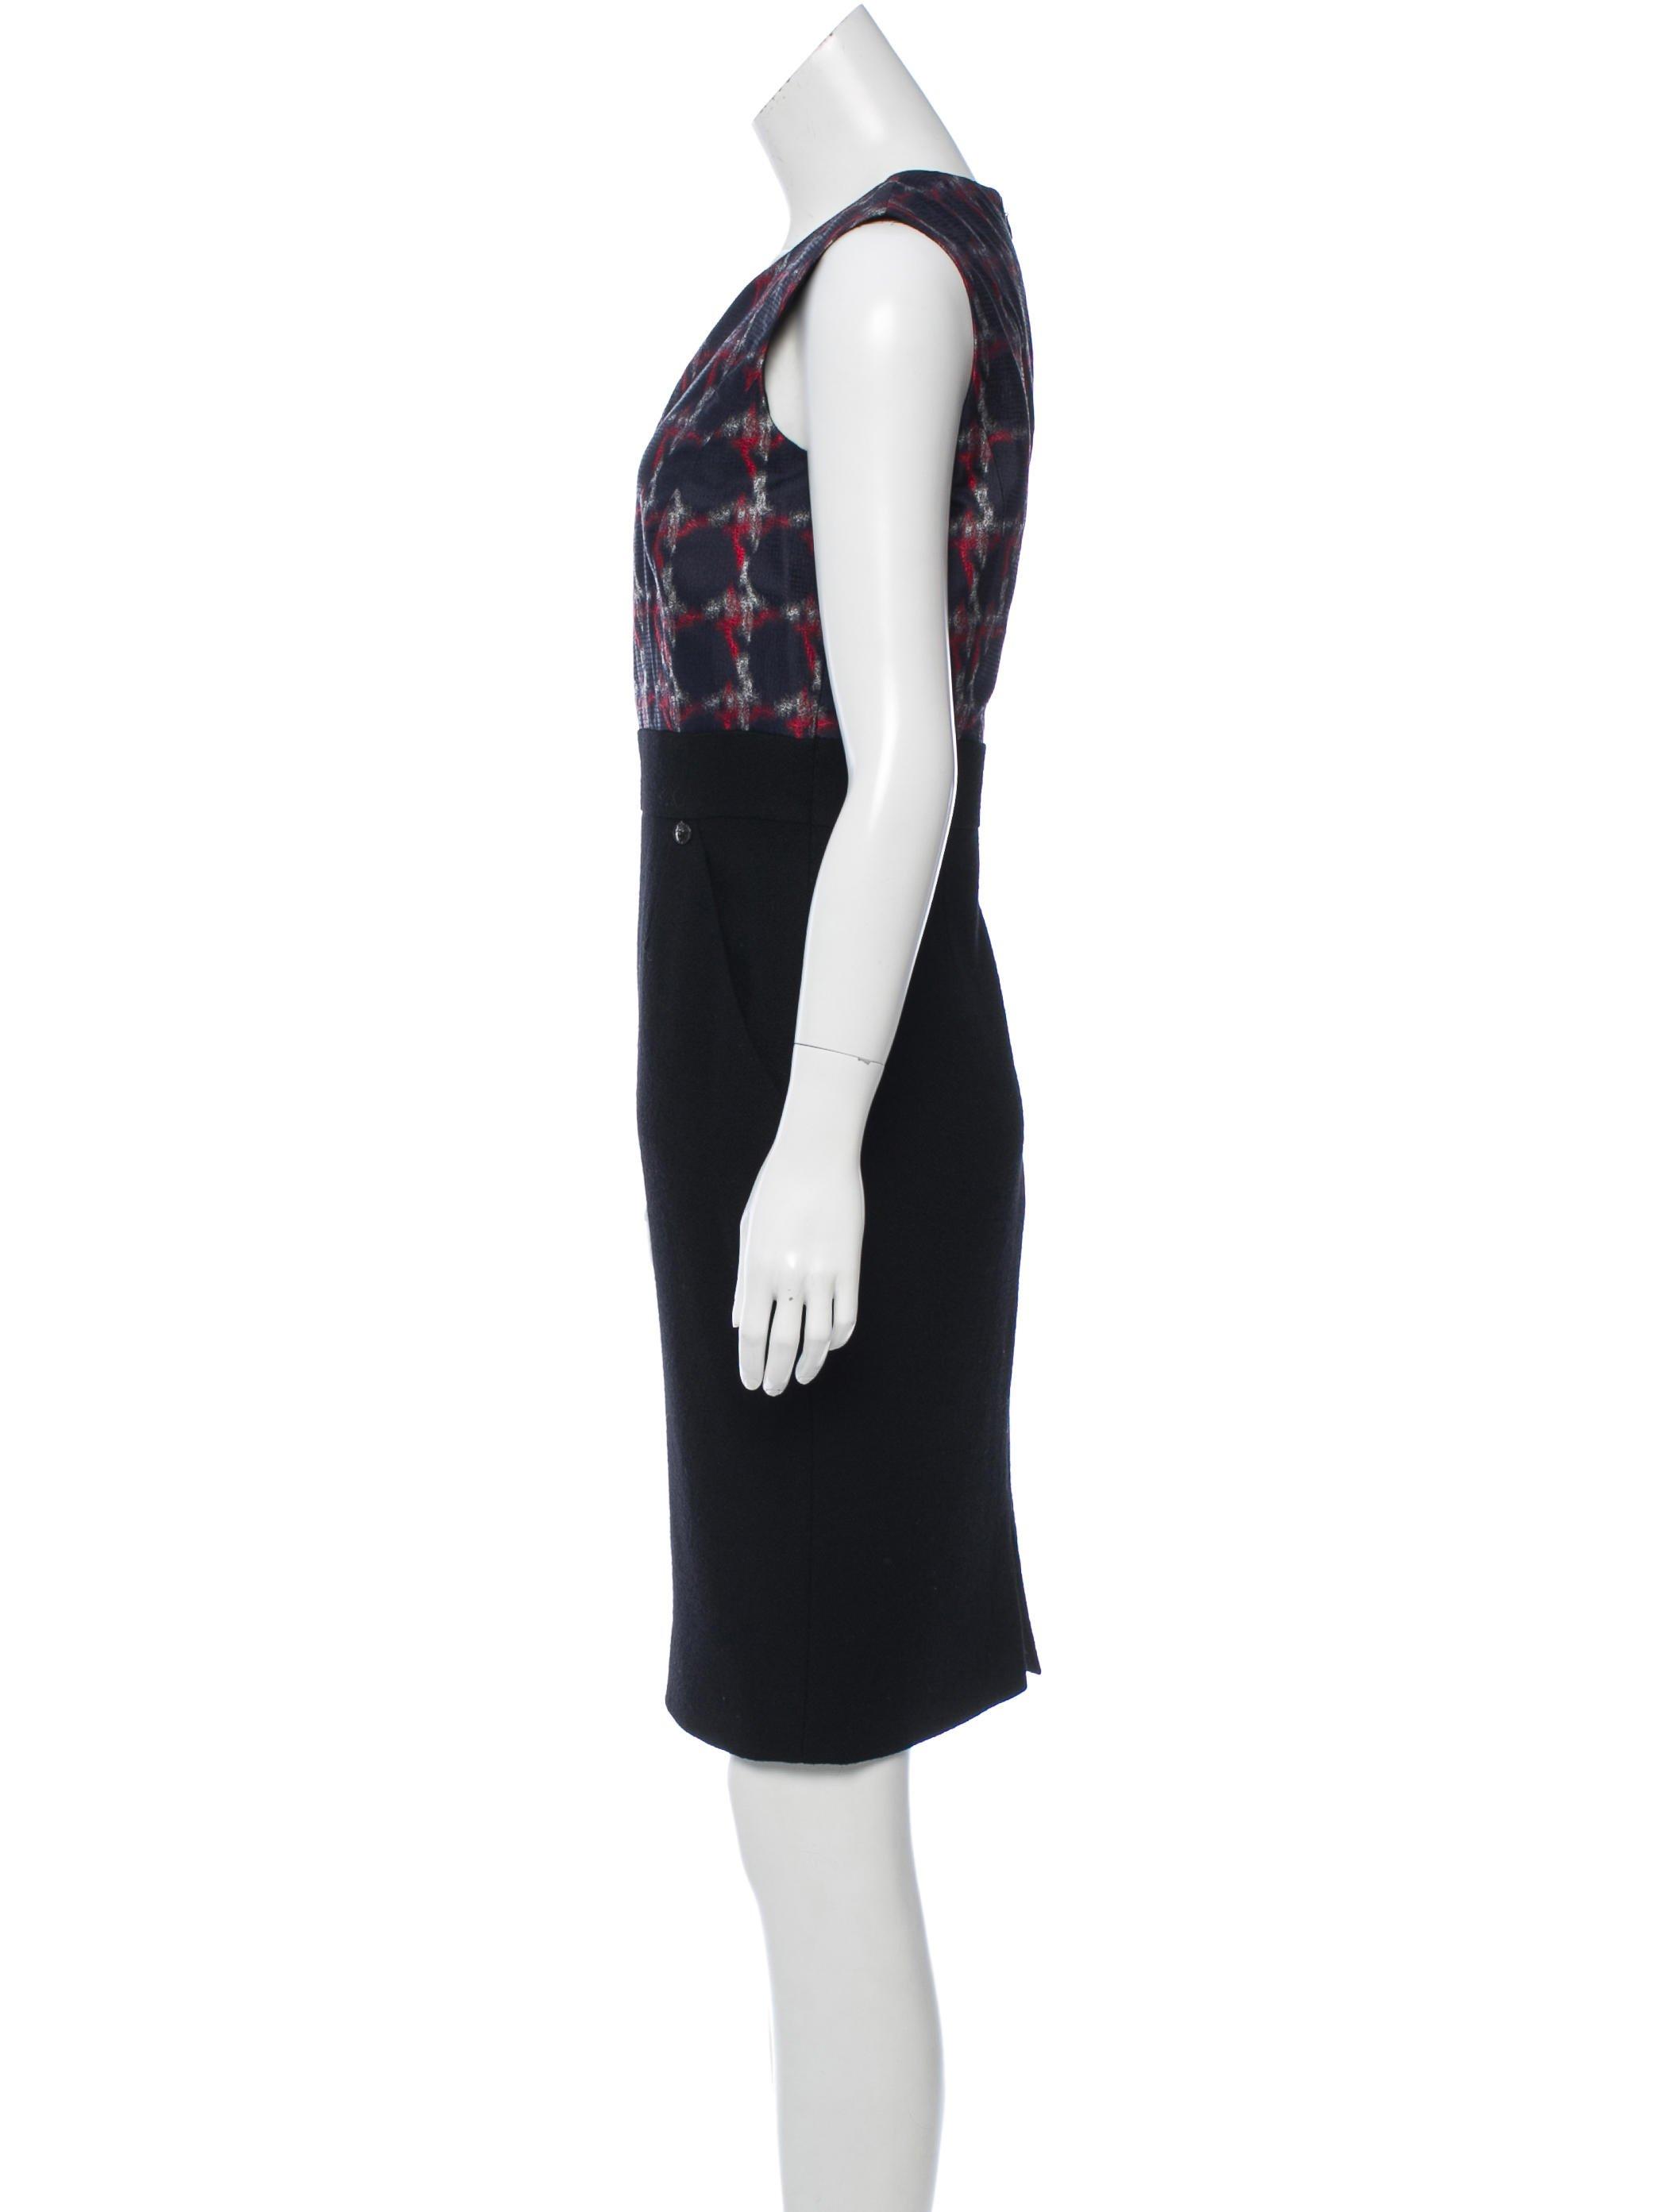 Chanel-Sheath-Dress-Sz-42-US-10-Wool-Printed-Top-Black-Skirt-2008-Collection_9134B.jpg